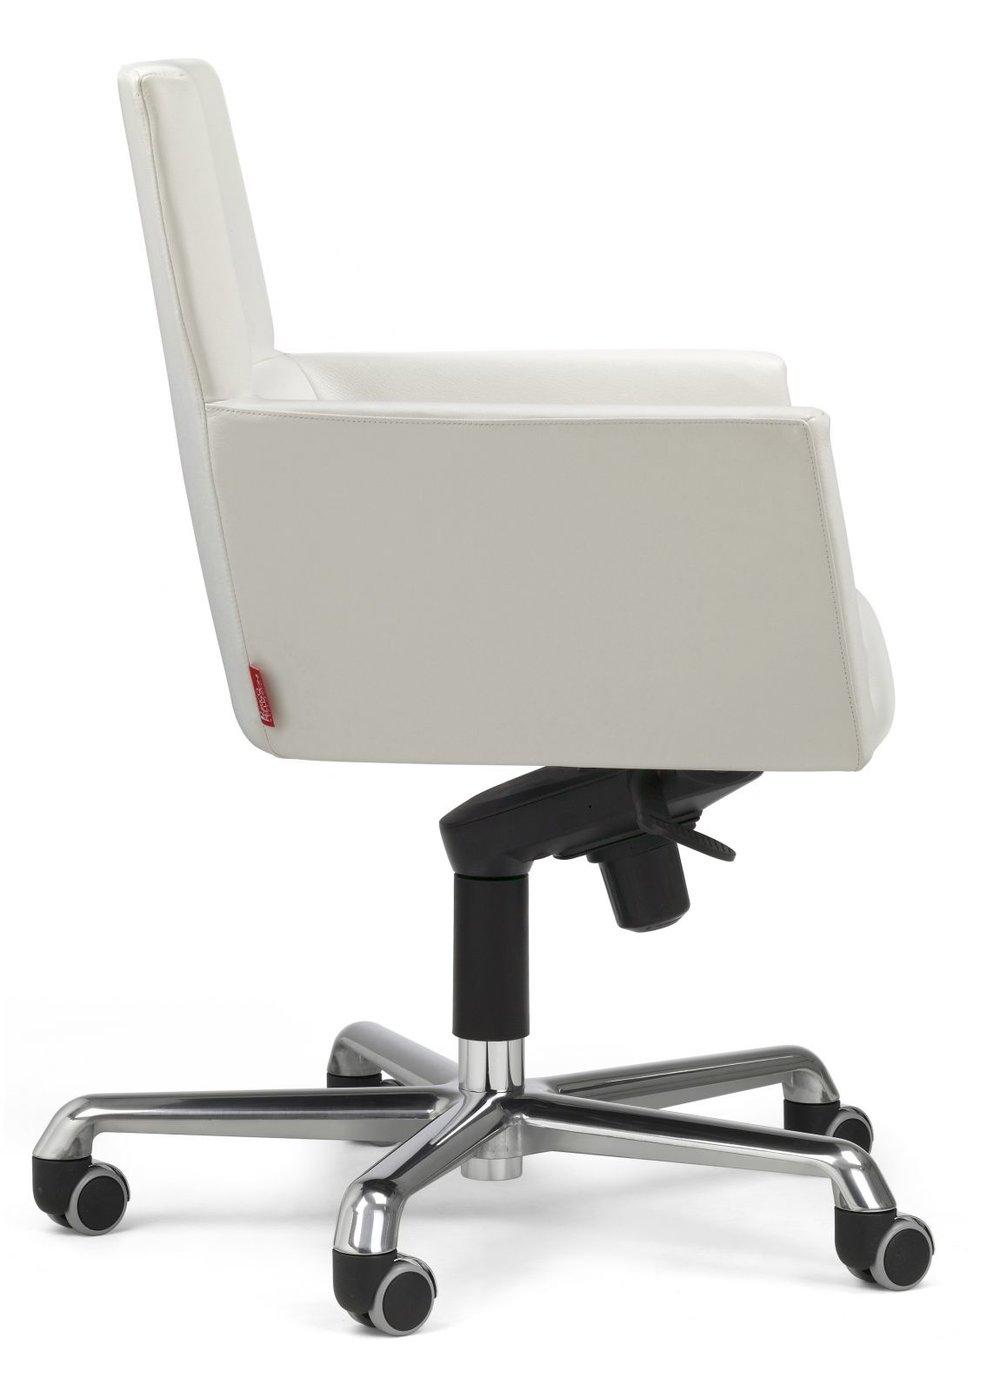 modern-office-chairs-Italian-furniture-designer-chairs (16).jpg